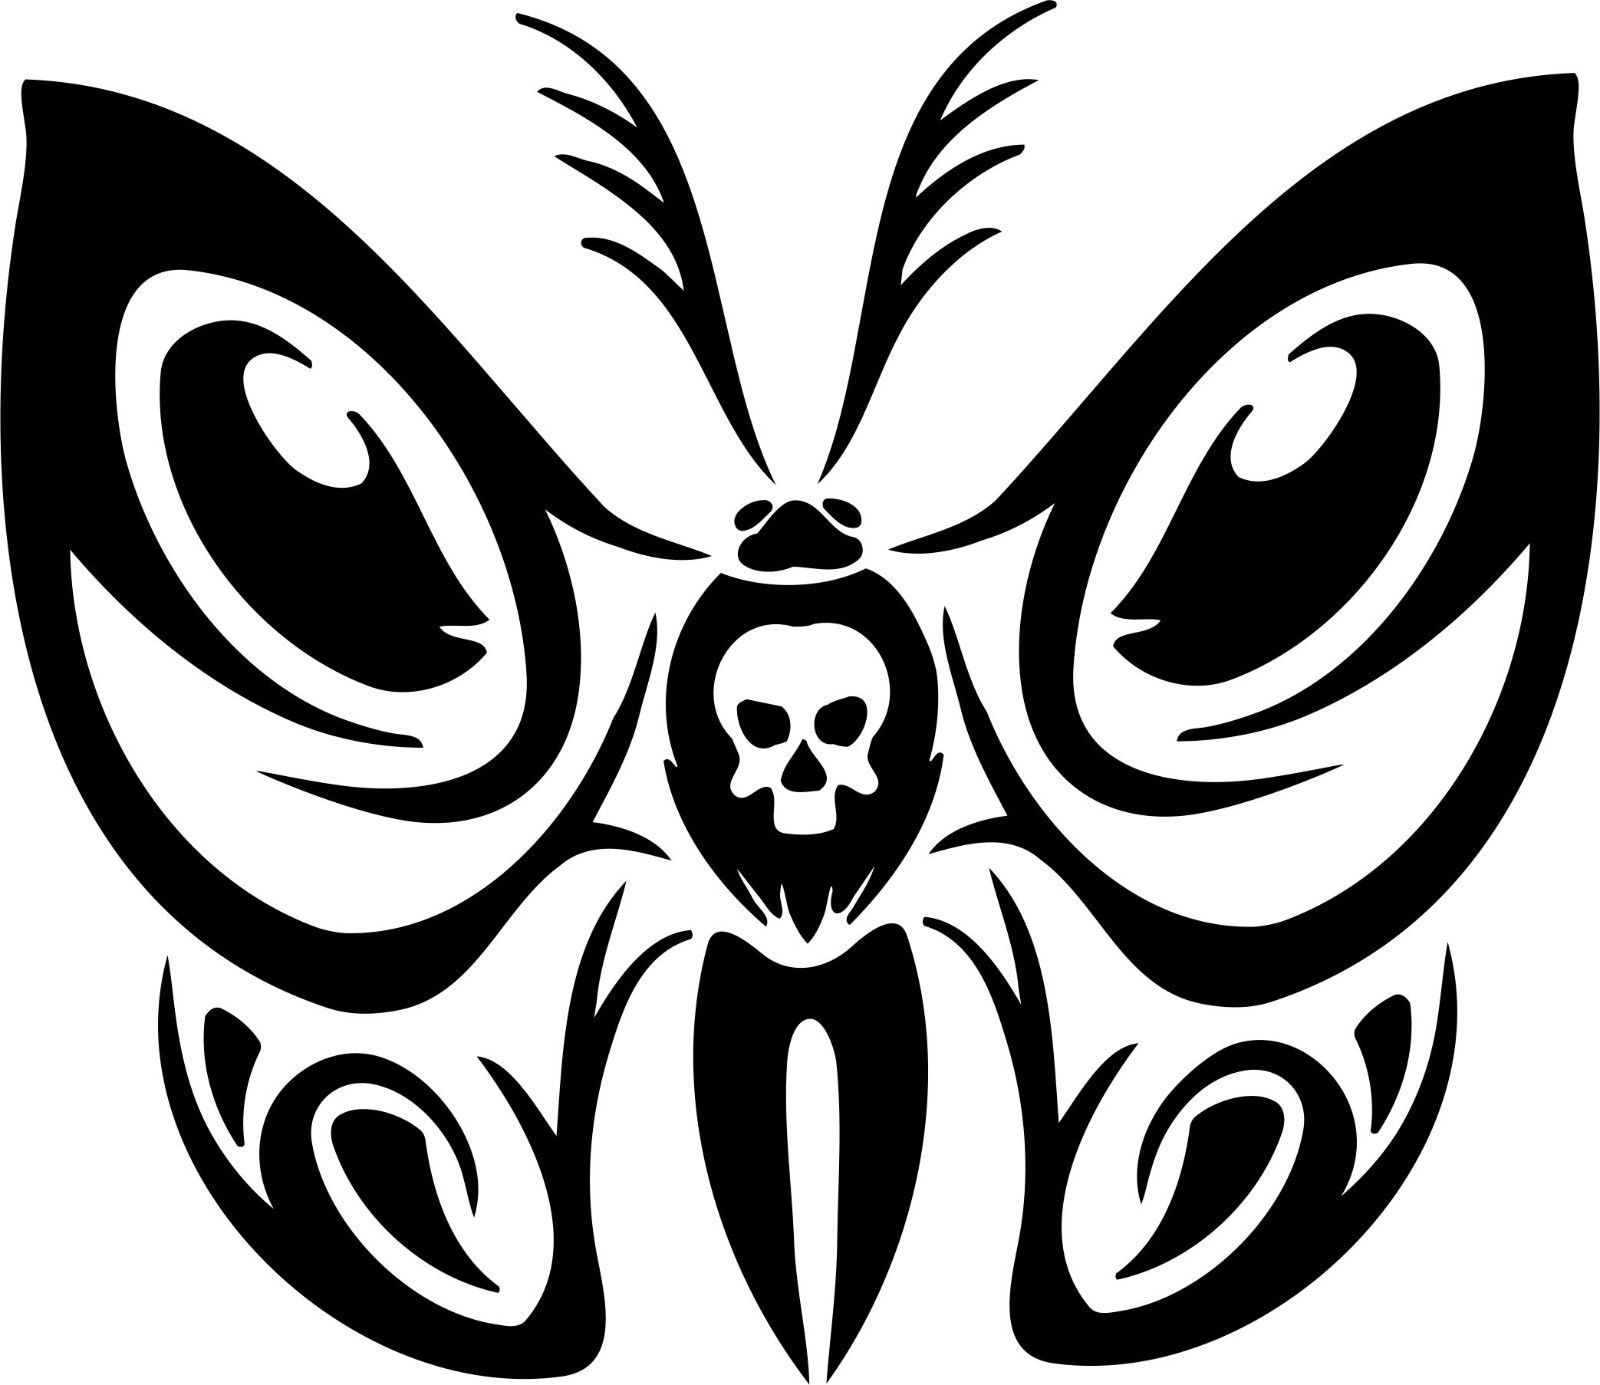 For butterfly tribal skull truck car window laptop vinyl decal sticker car styling